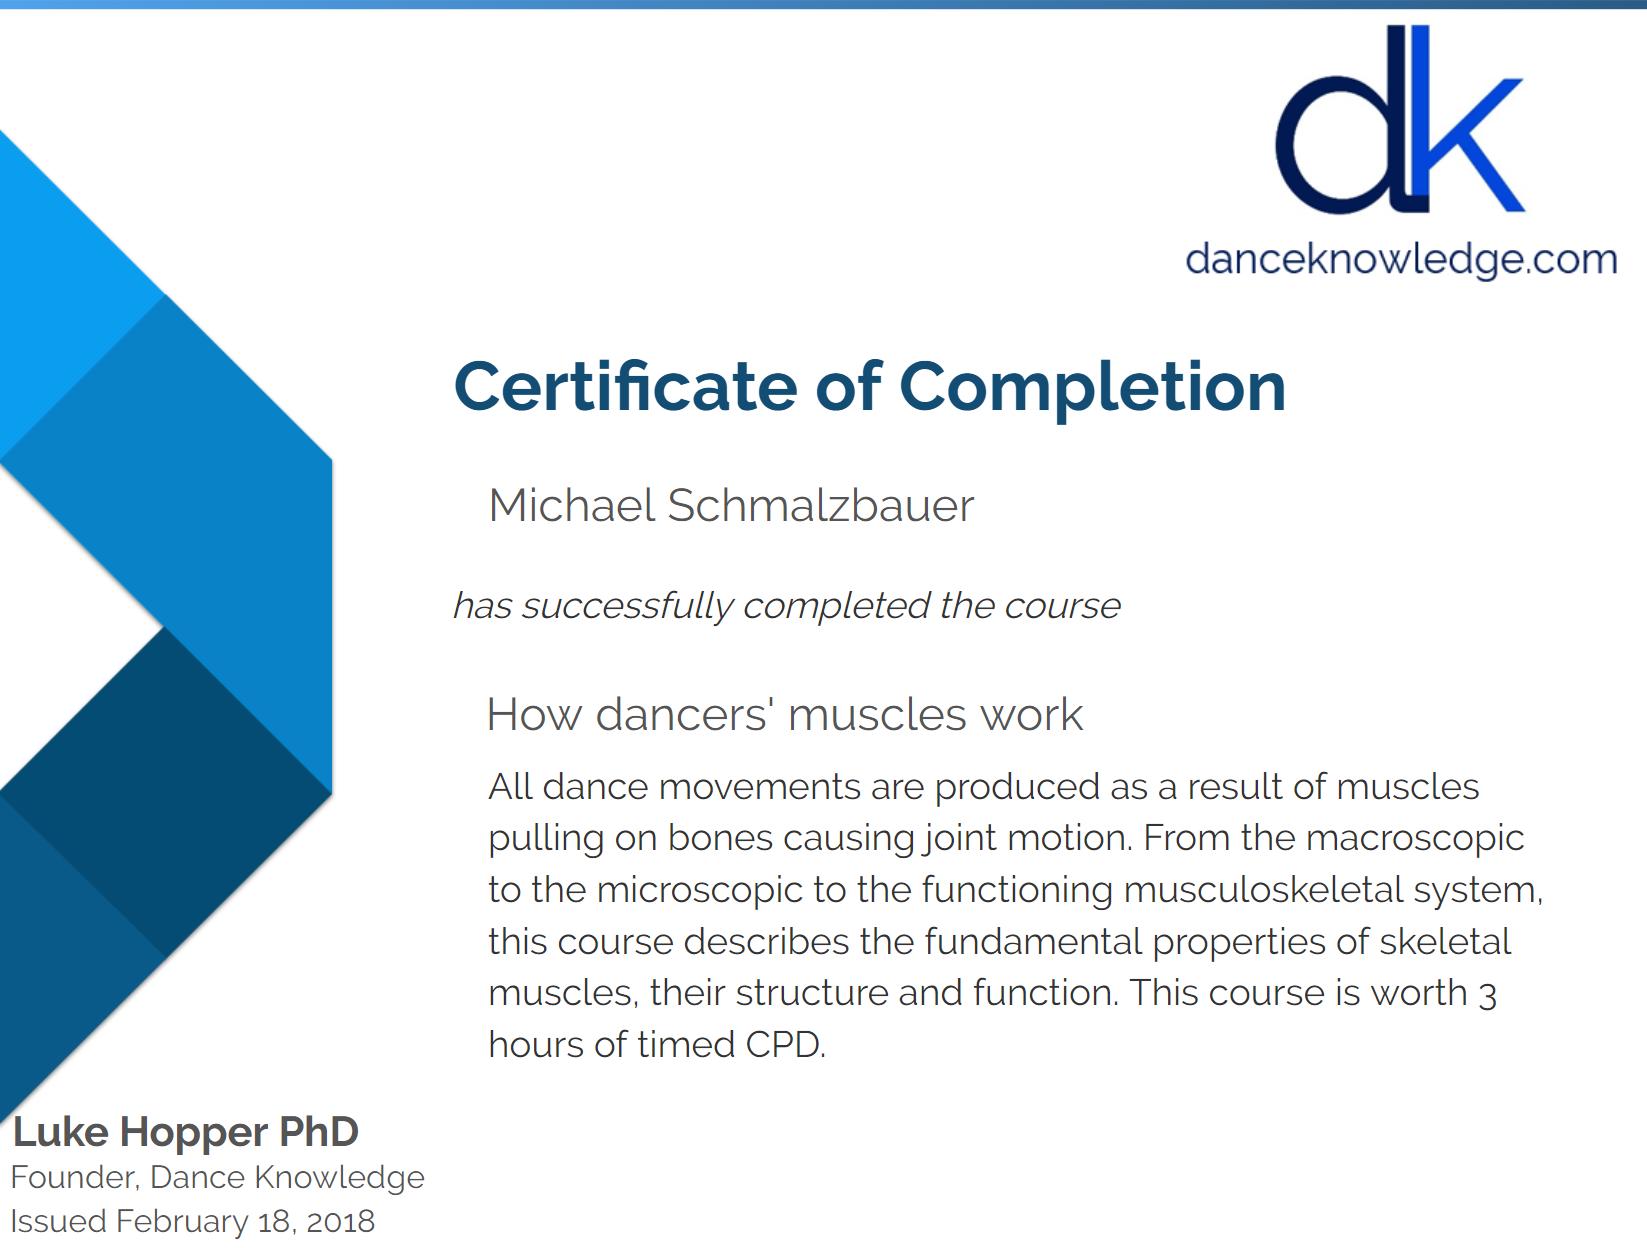 Dance Knowledge